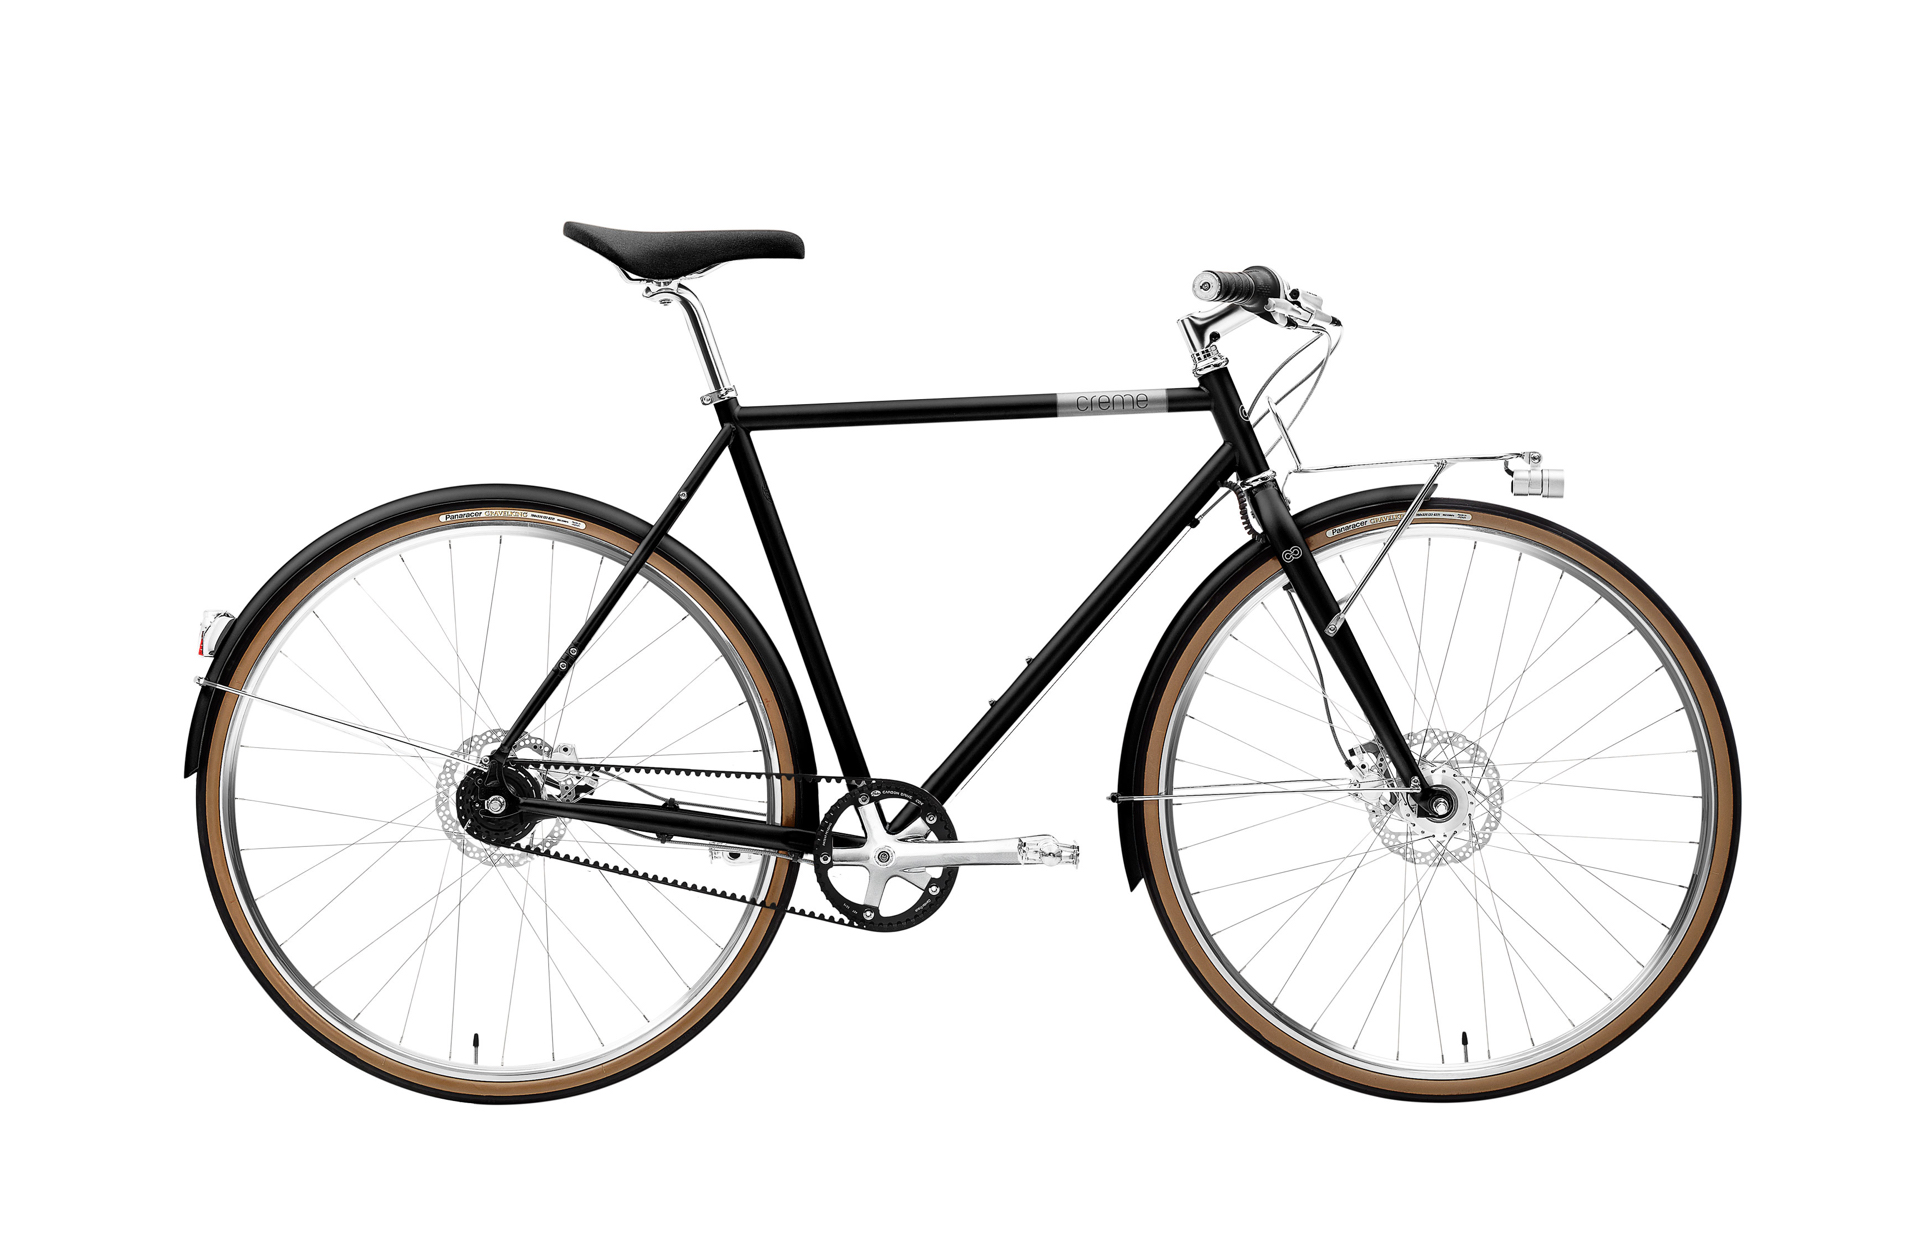 Bicicleta Creme Ristretto Bolt Carbon Gray Go By Bike